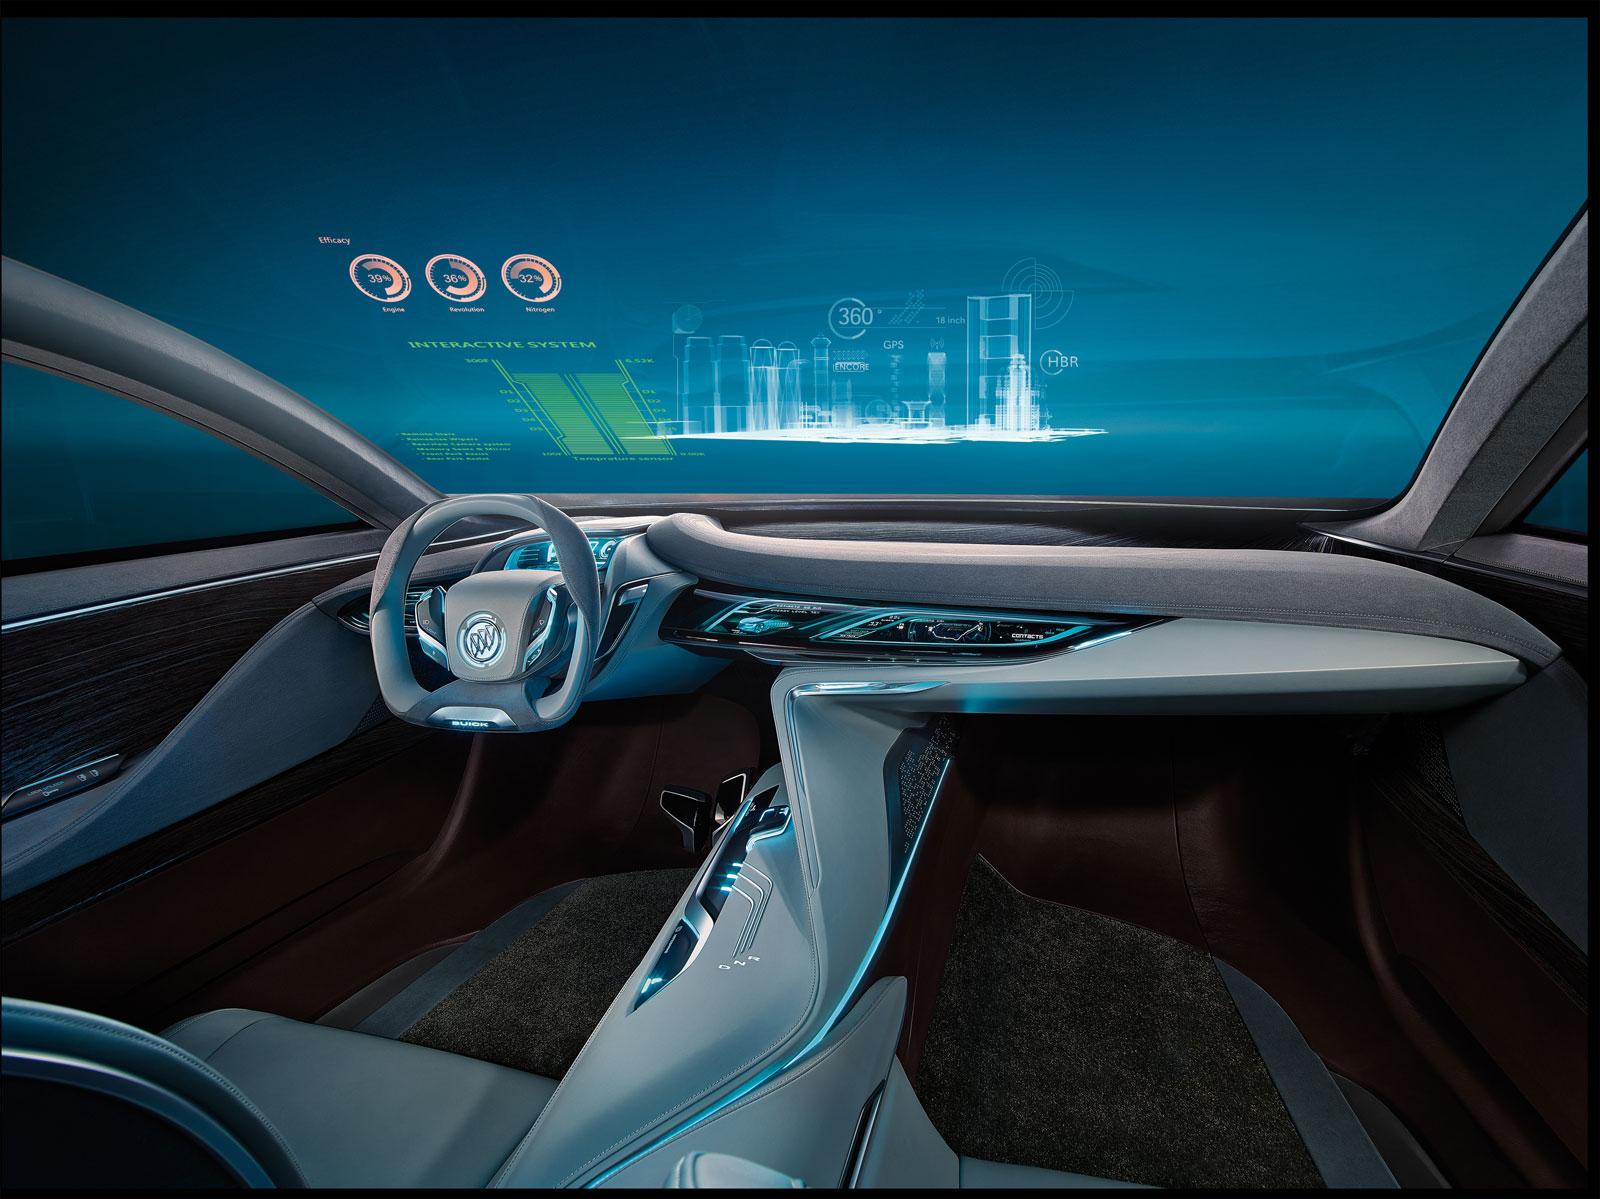 Buick Riviera Concept Interior Rendering - Car Body Design